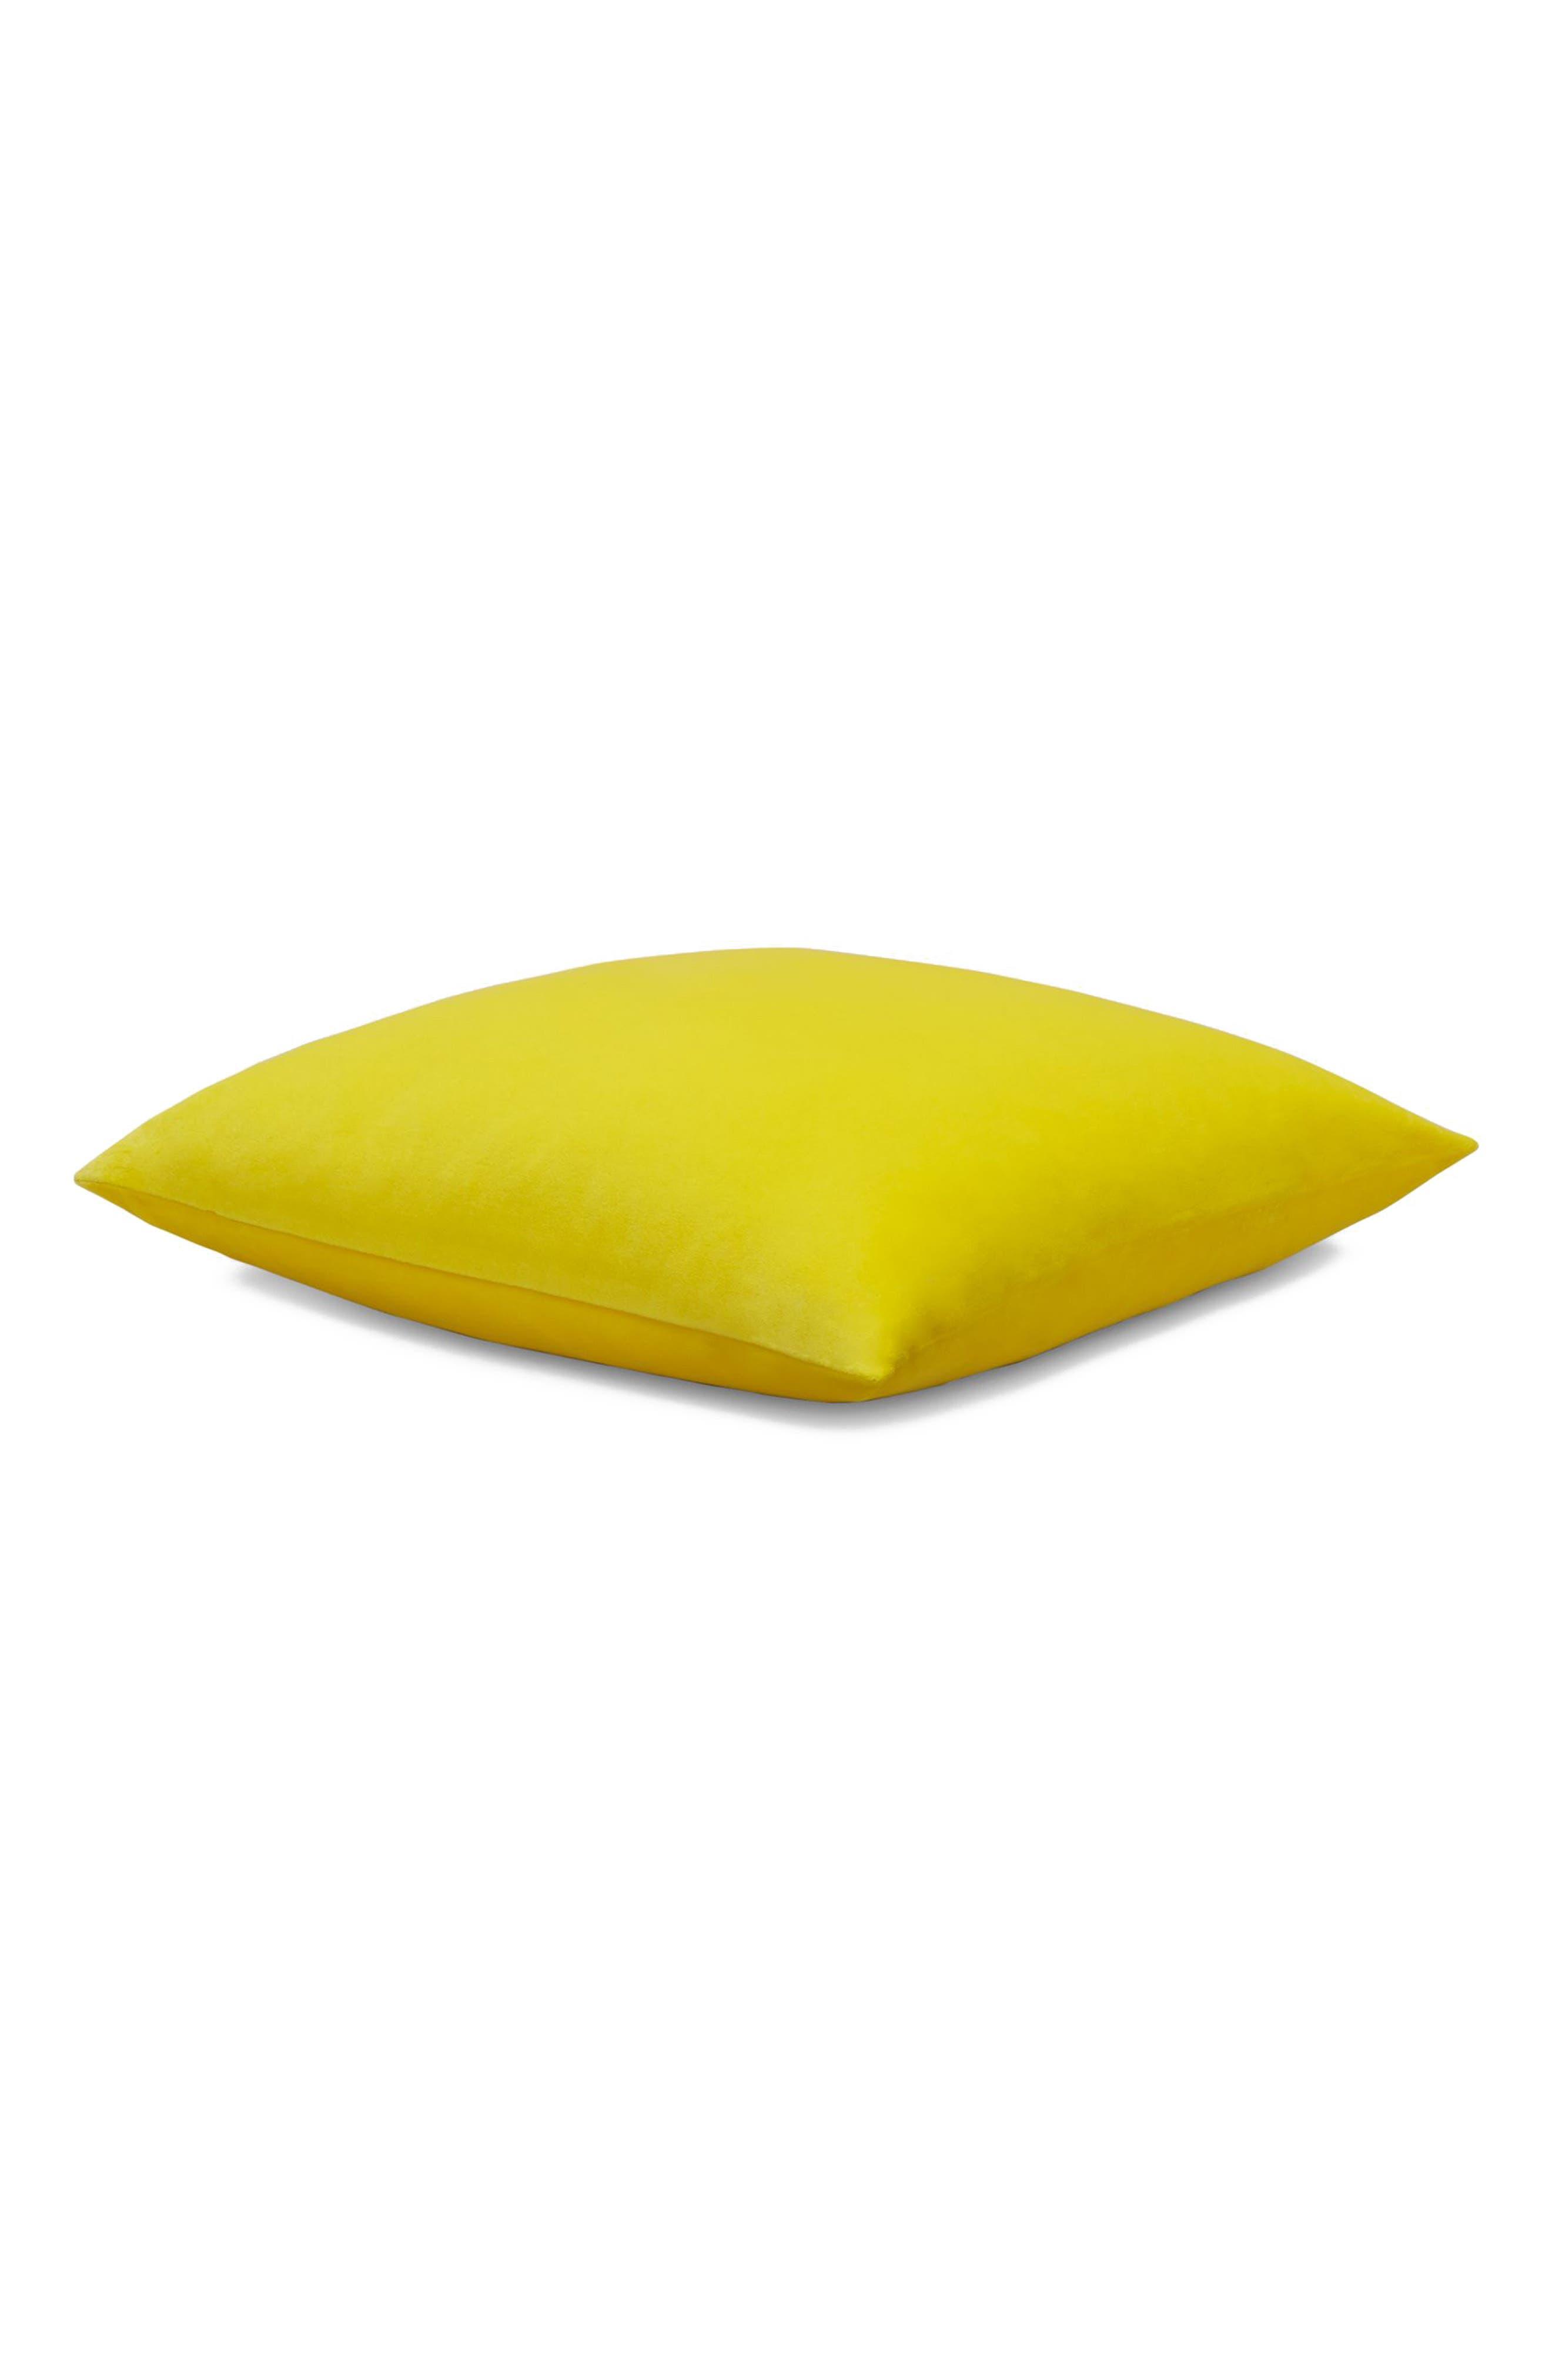 Calvin Klein Home Lucerne Velvet Accent Pillow